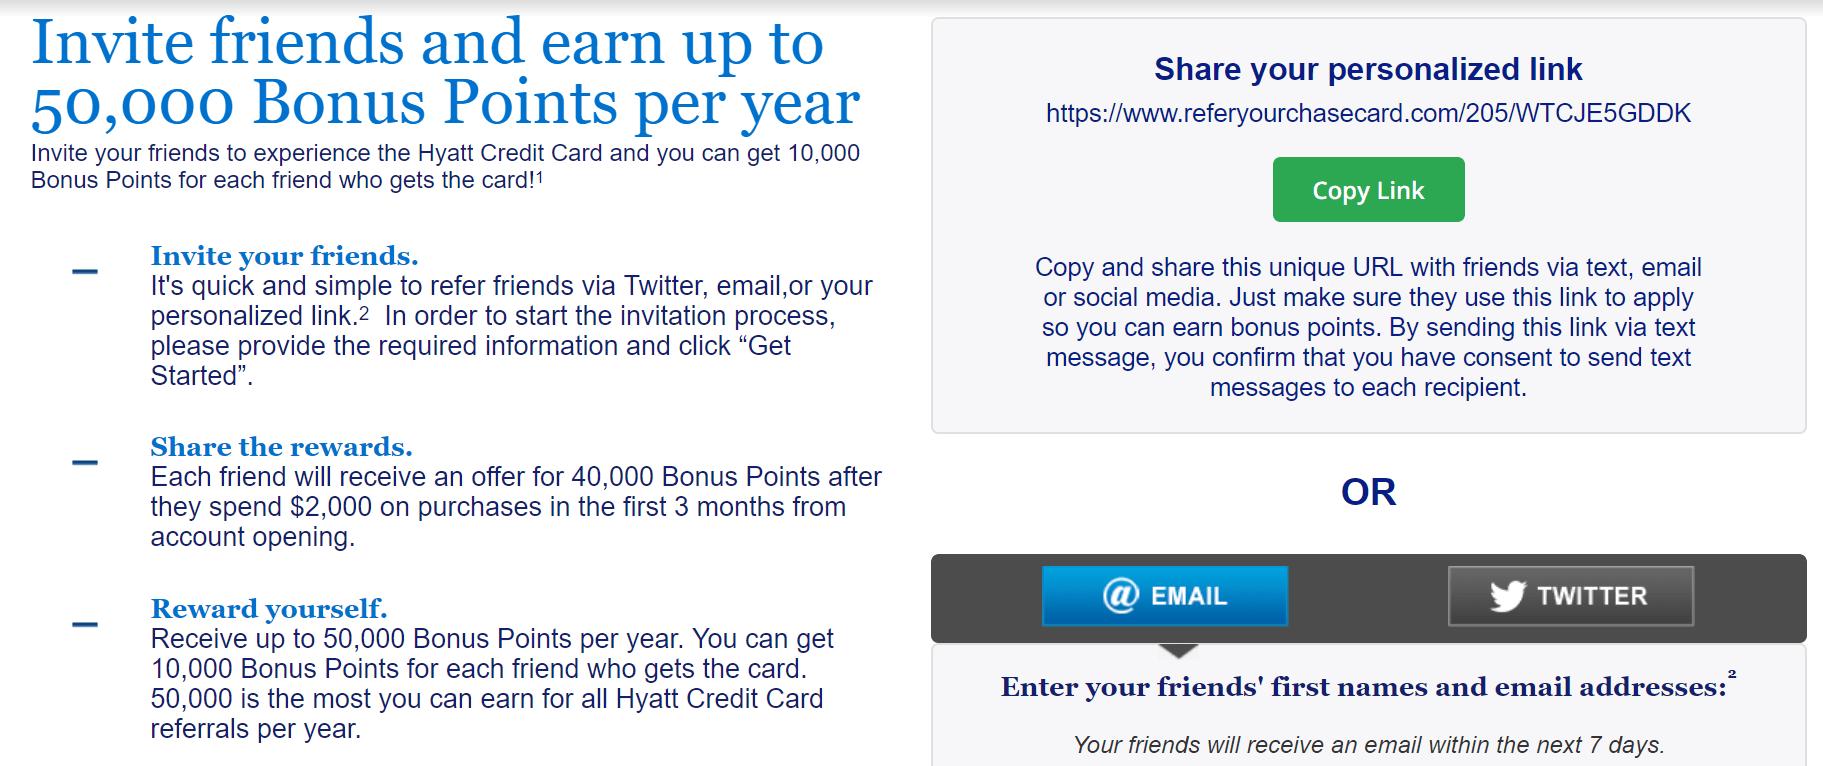 Chase Hyatt 信用卡【11/9更新:开放了refer,一人10k】